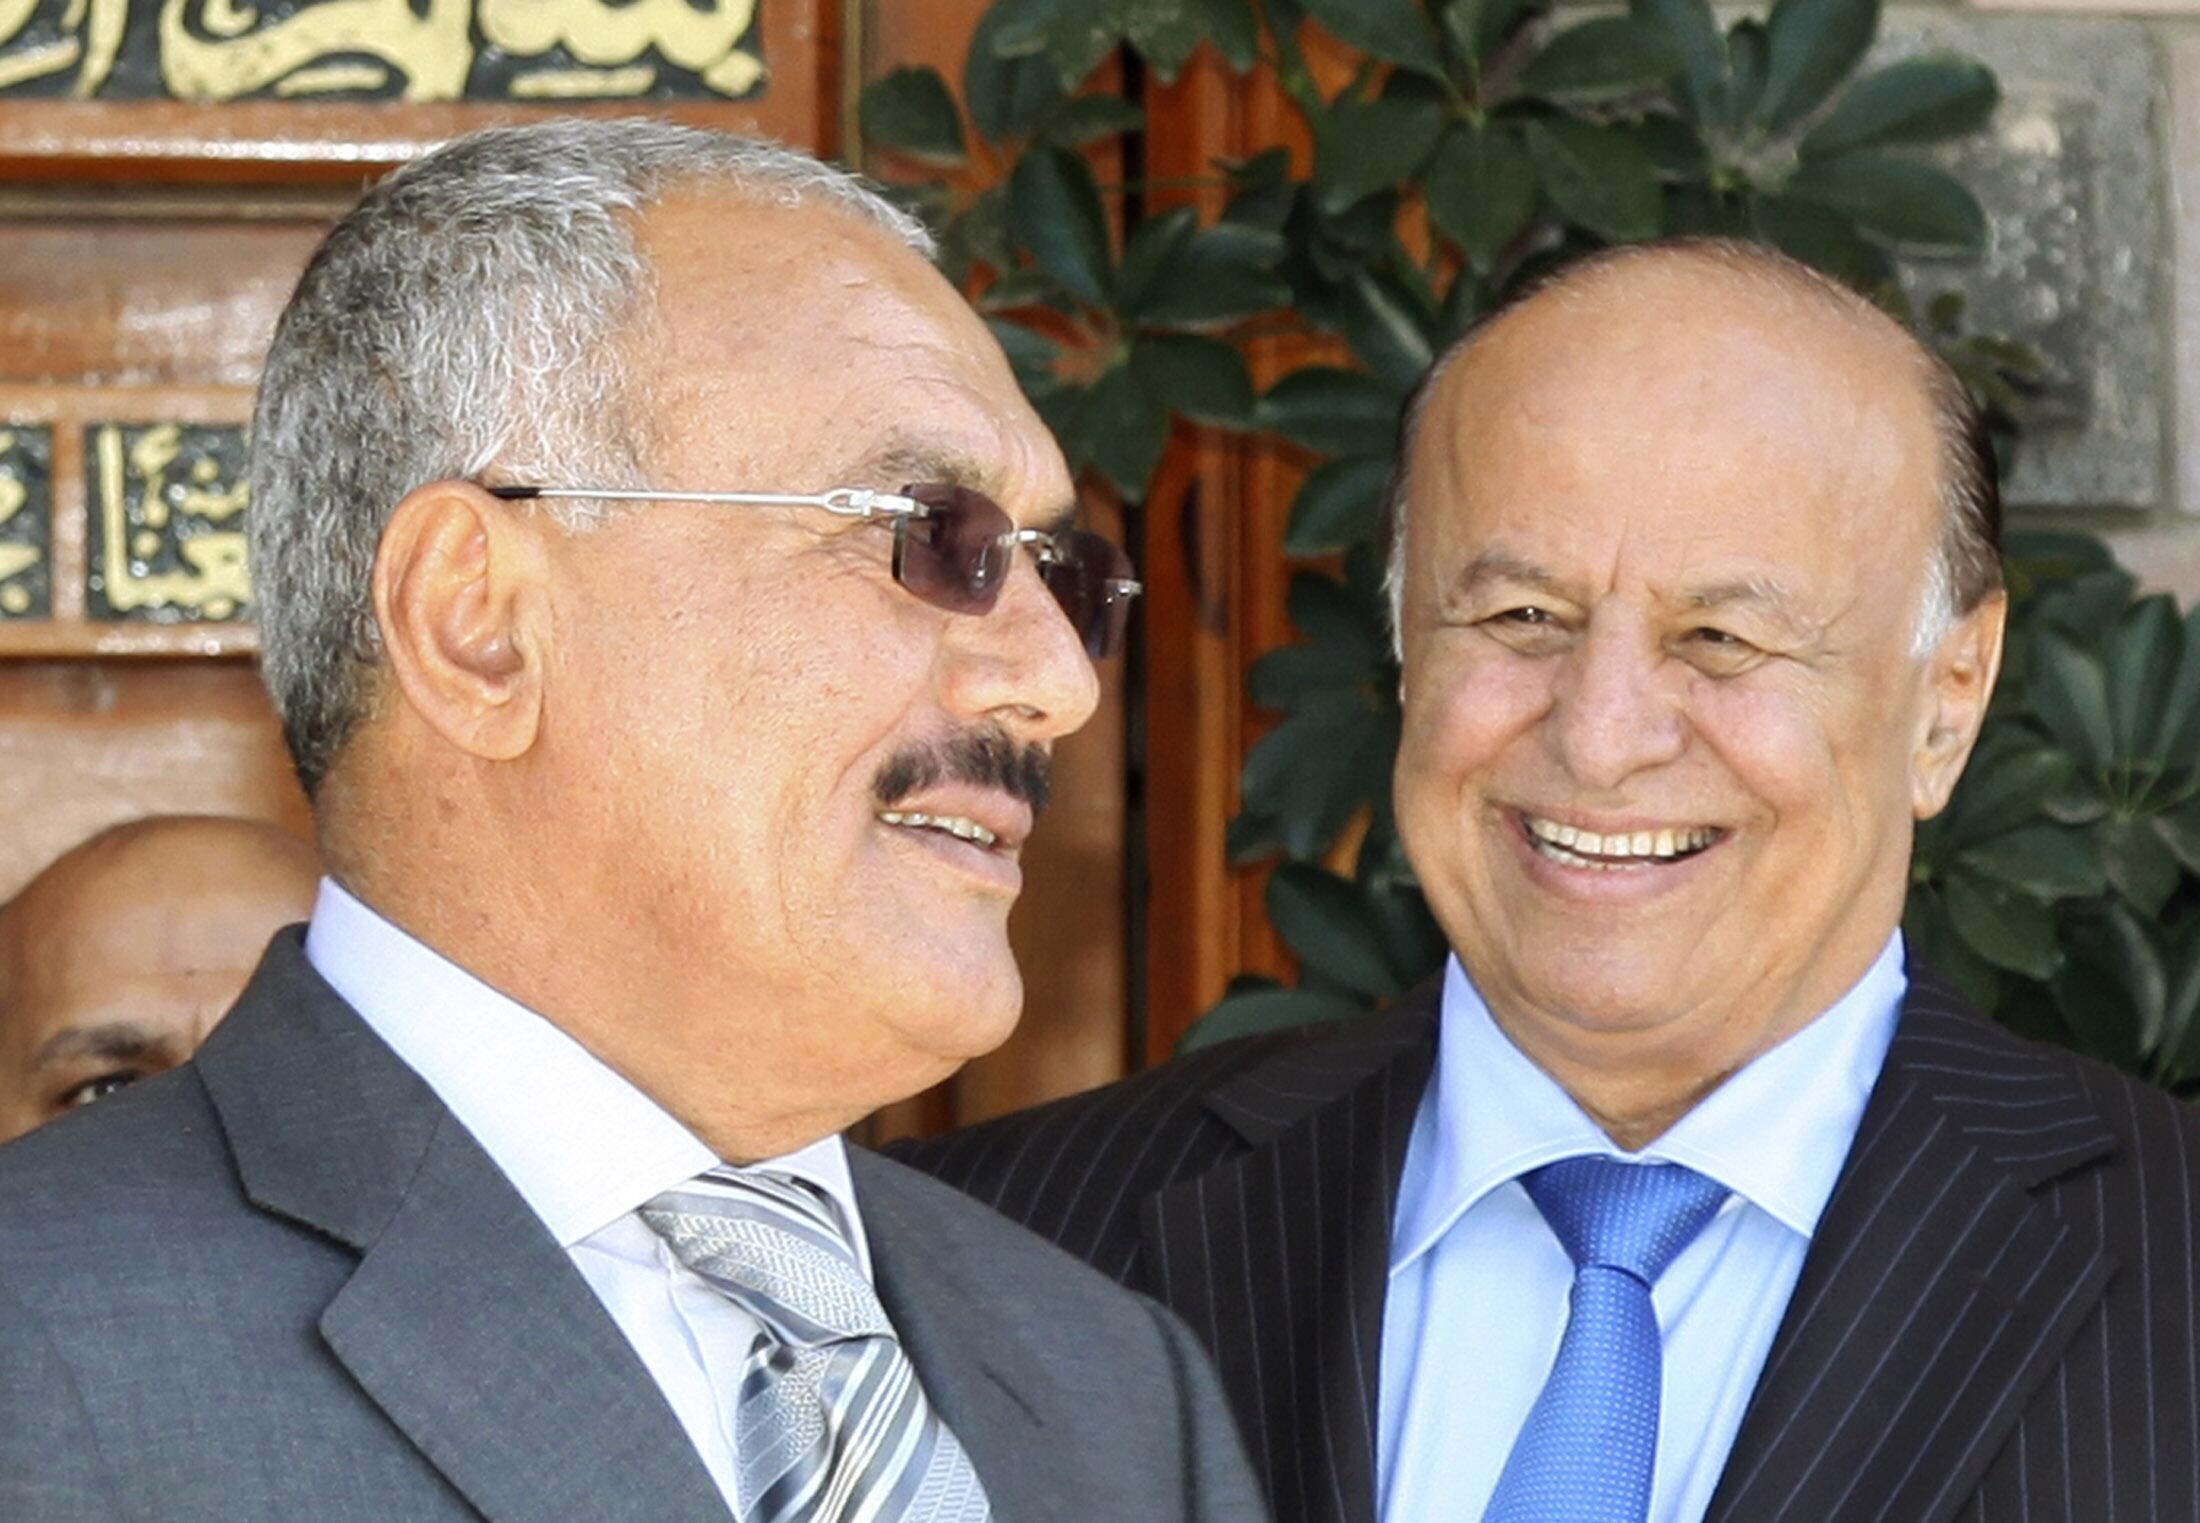 Yemen's President Ali Abdullah Saleh (L) and Vice President Abd-Rabbu Mansour Hadi smile at the Presidential Palace in Sanaa February 9, 2011.